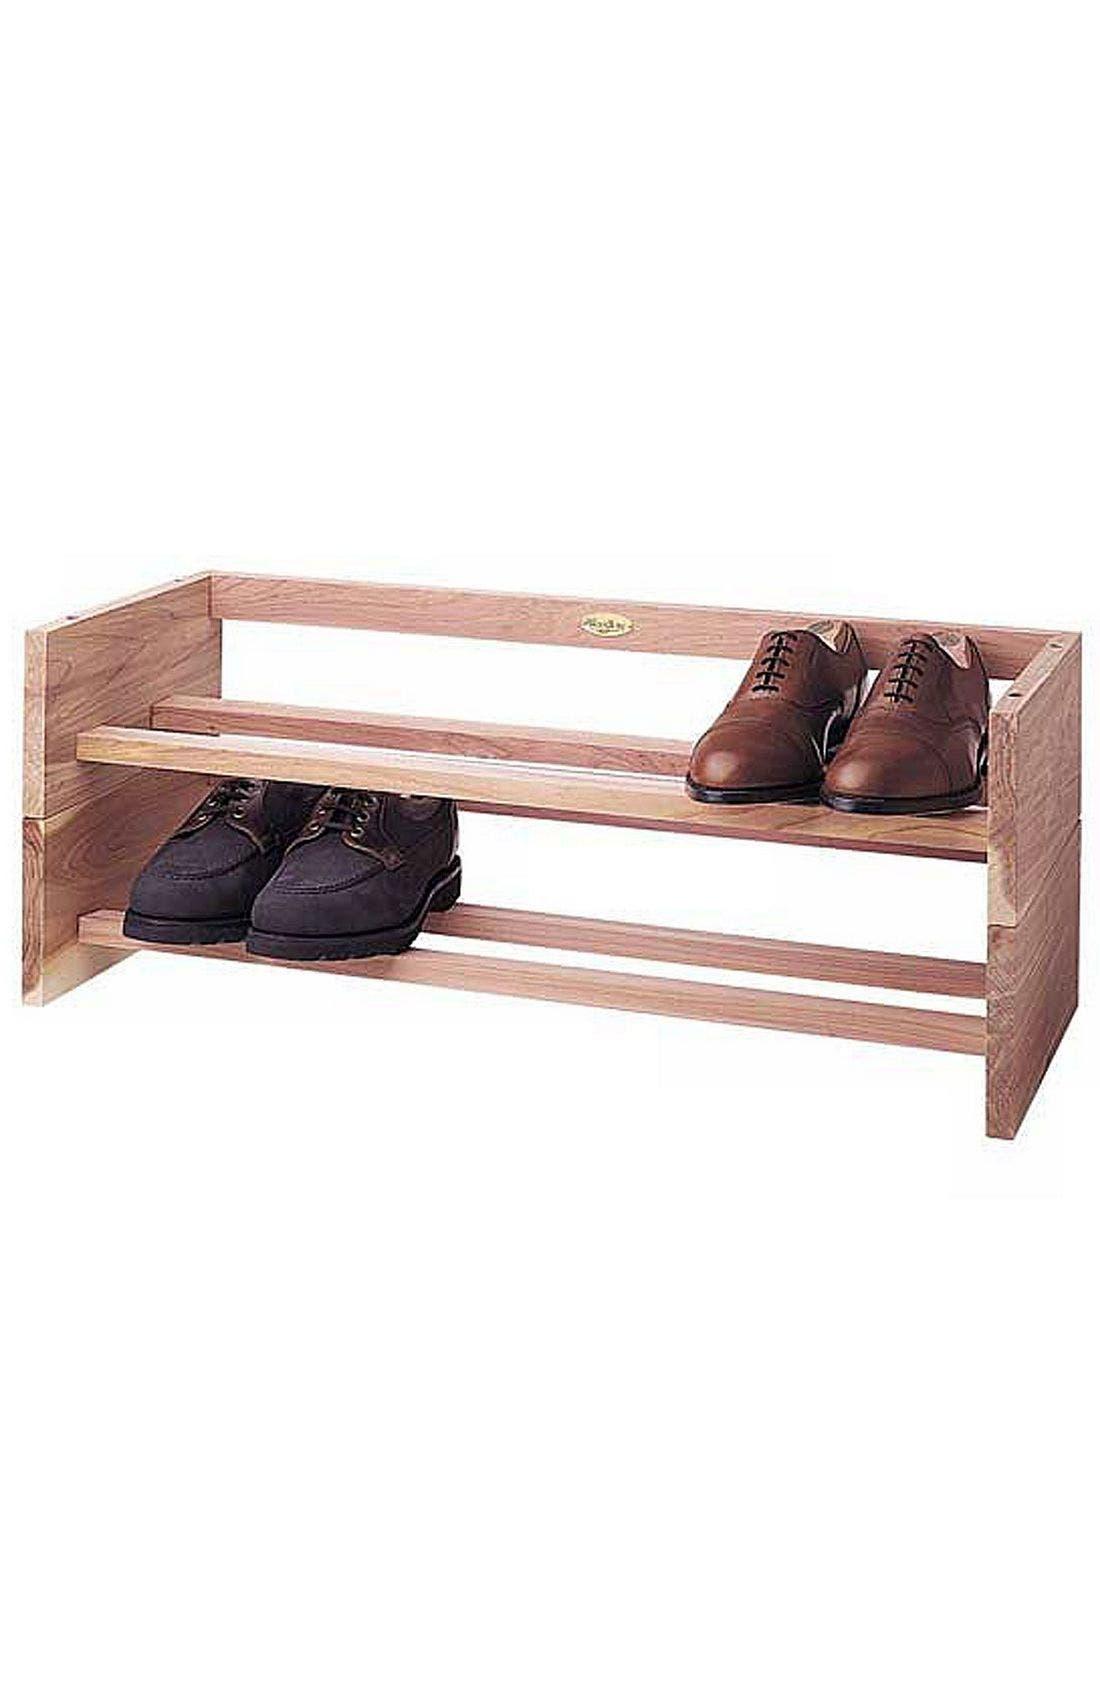 Main Image - Woodlore Cedar Shoe Rack